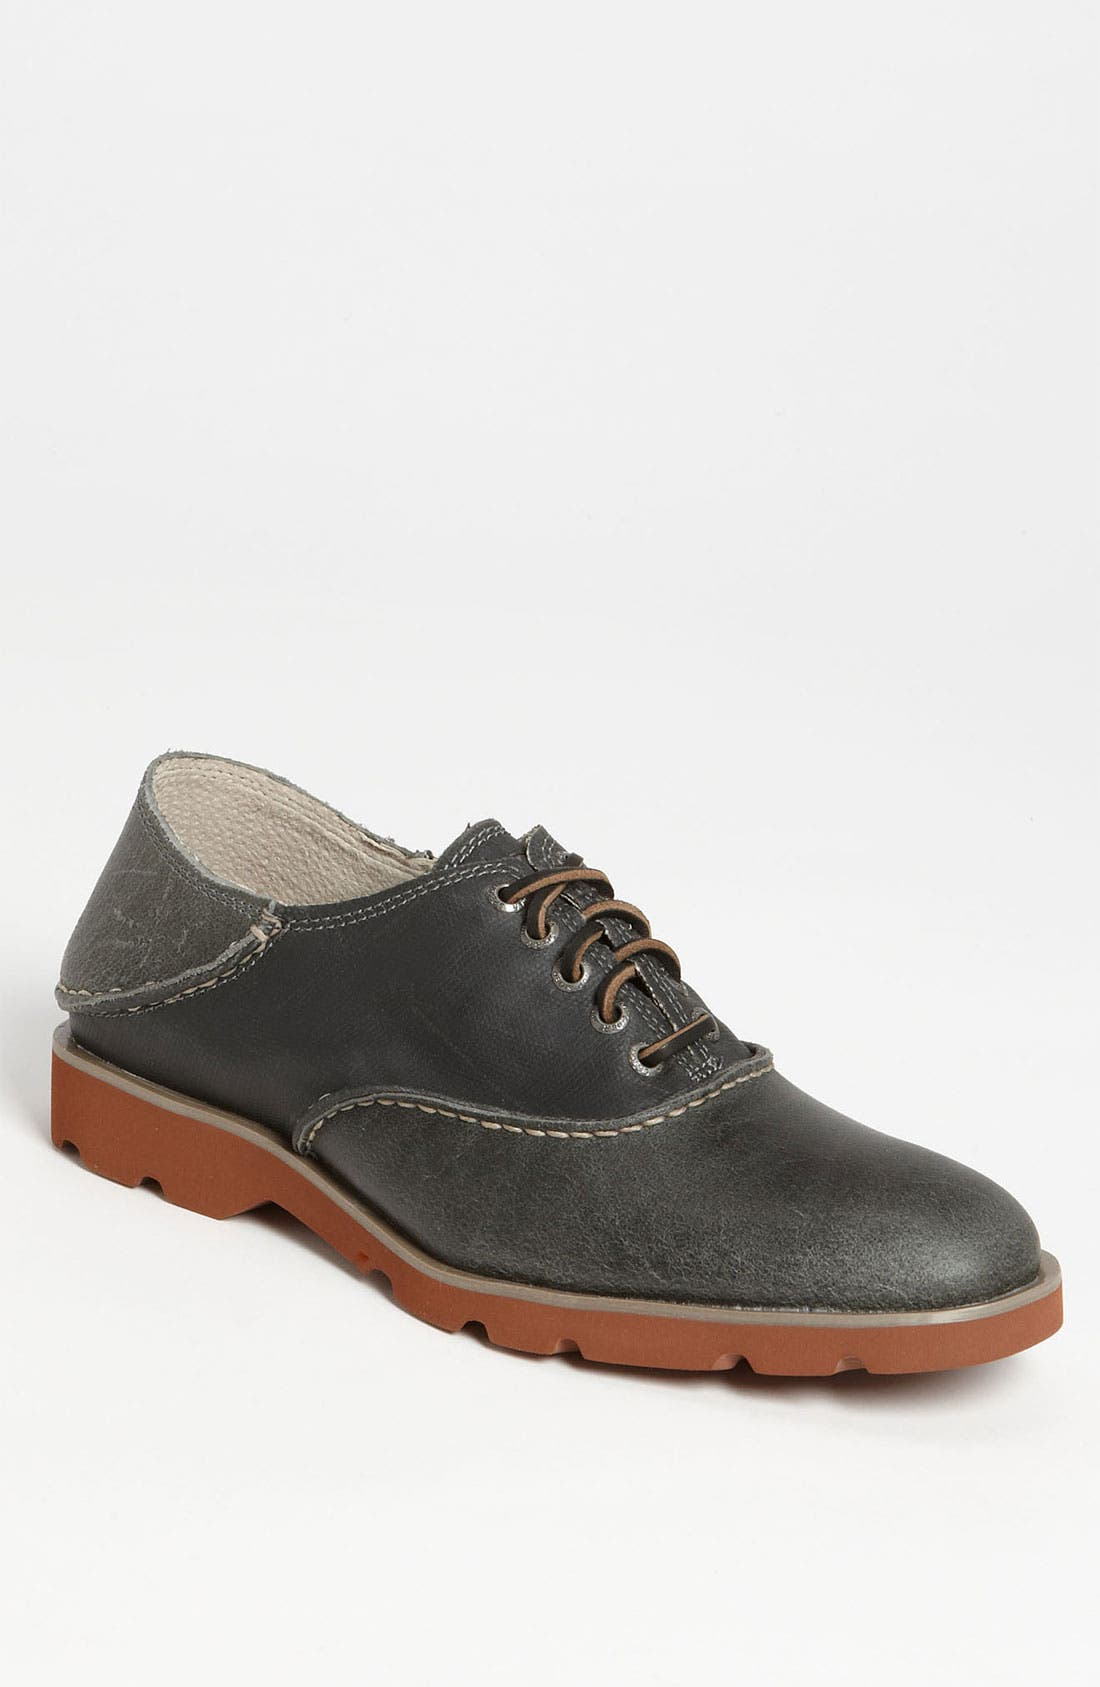 Alternate Image 1 Selected - Sperry Top-Sider® Herringbone Saddle Shoe